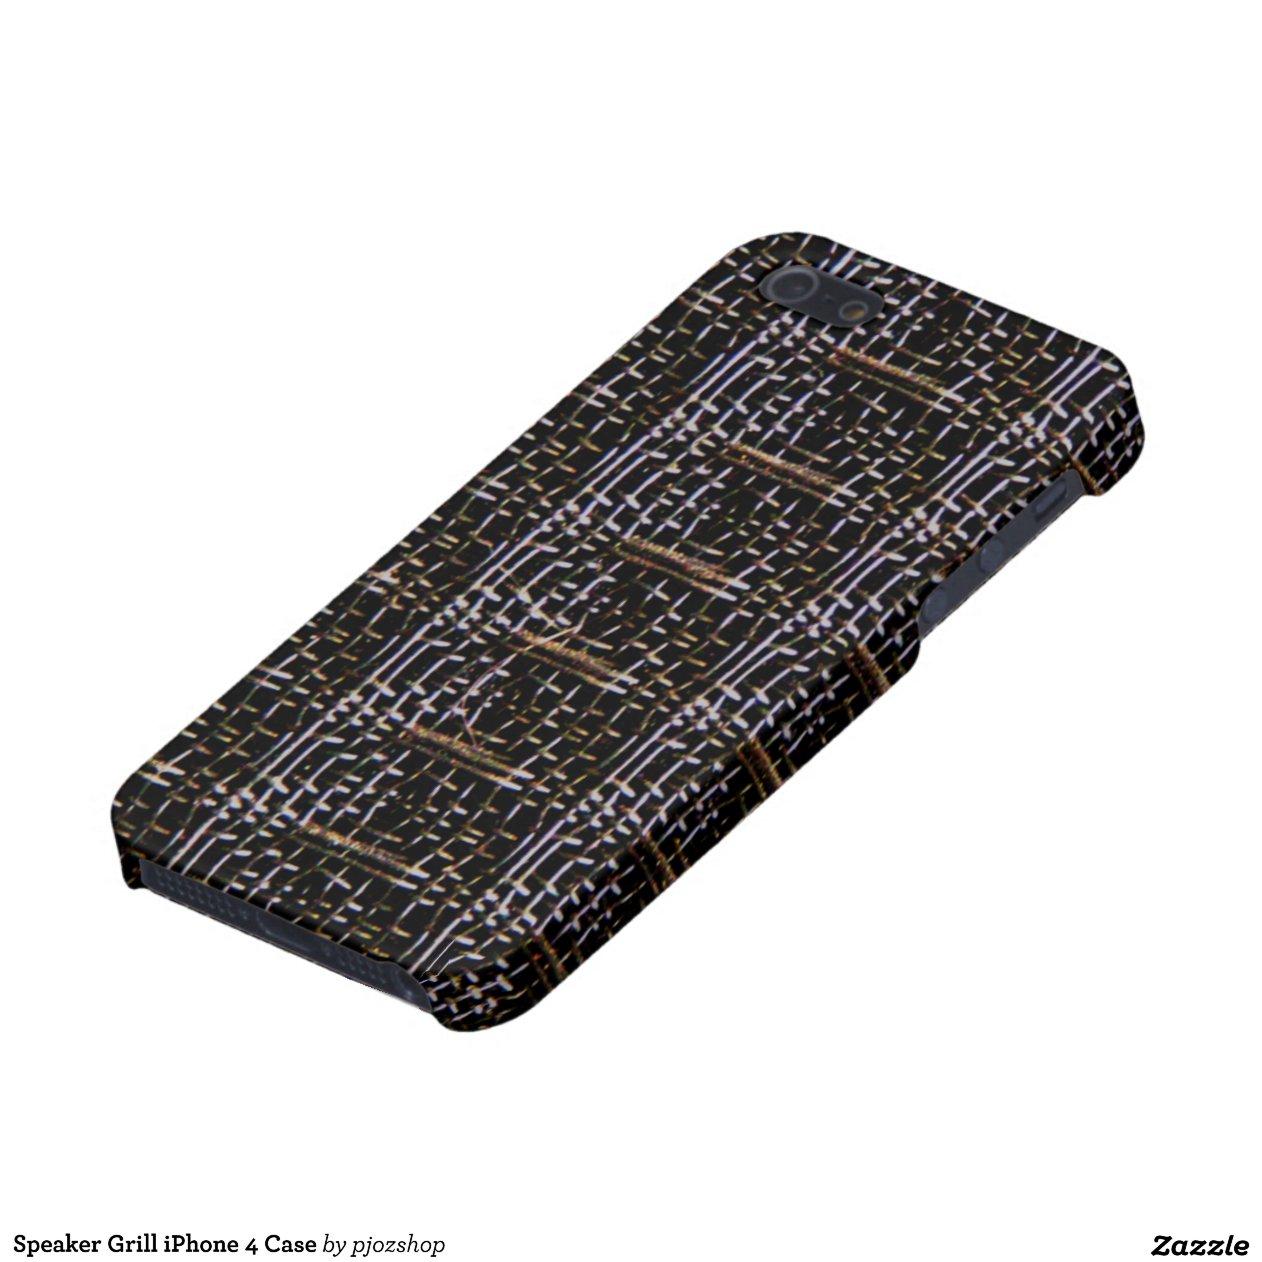 1 Speaker Working Iphone 4 Speaker Grill Iphone Case Rddcbaafdffbb Vxv Byvr